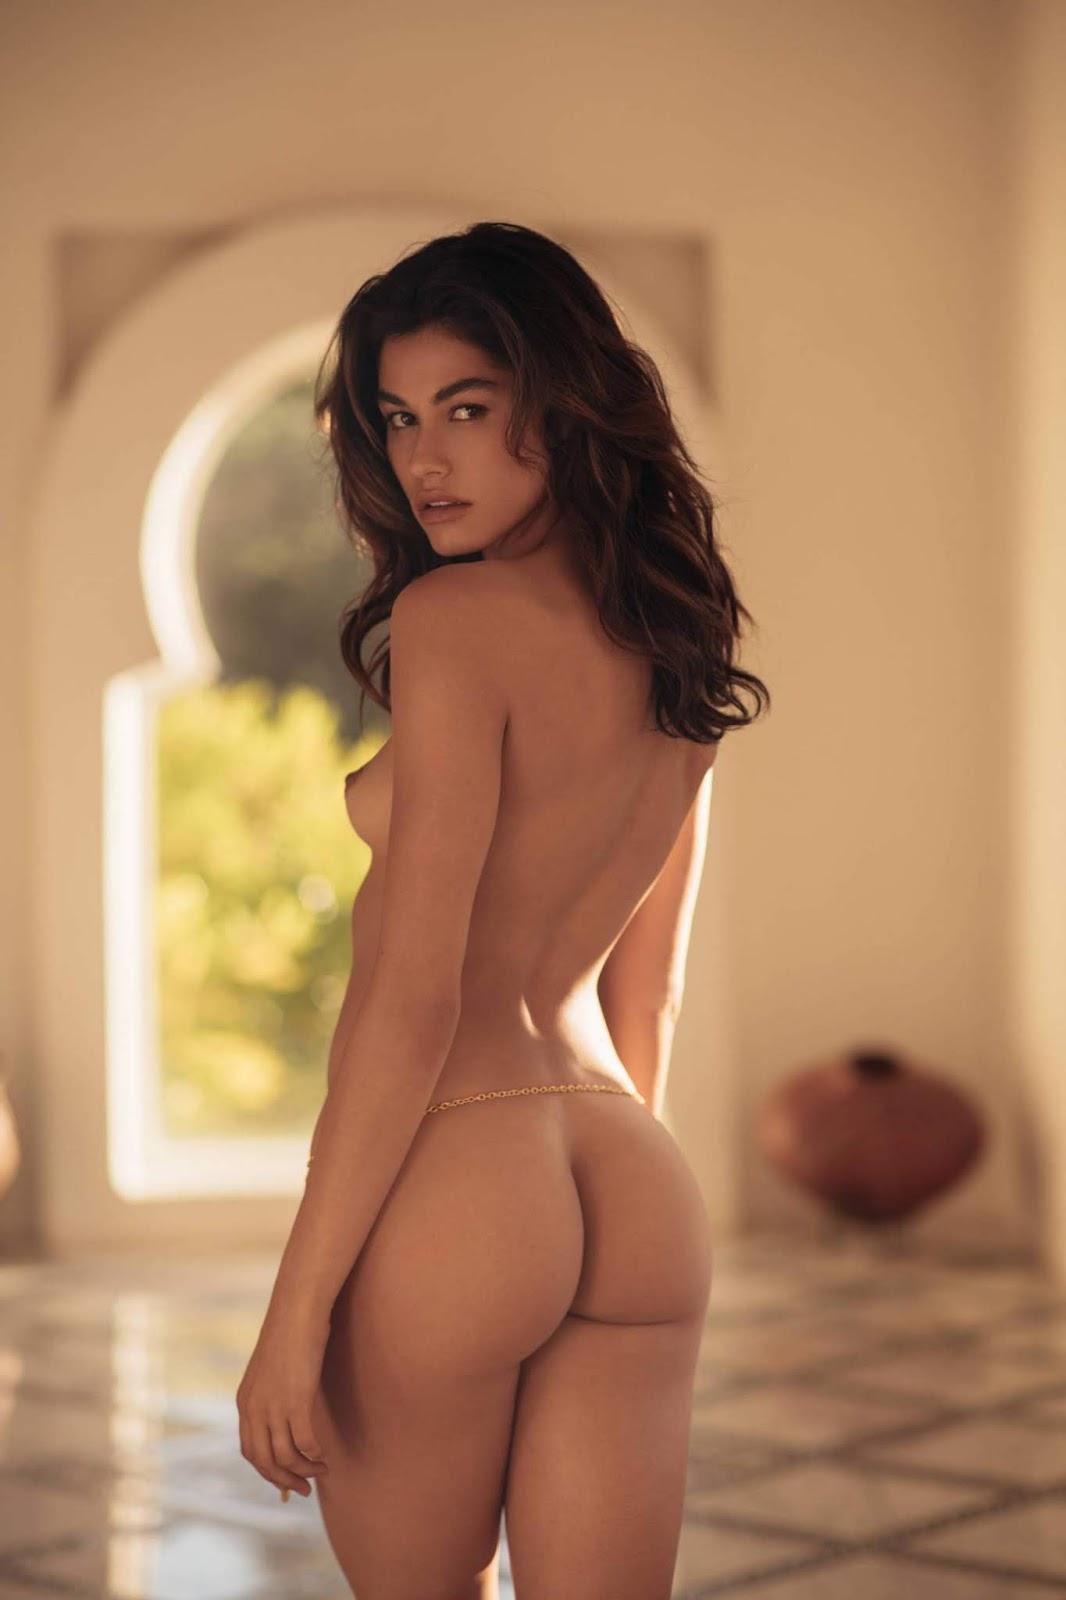 Lorena Medina – Nude Model Photo Shoot by Christopher von